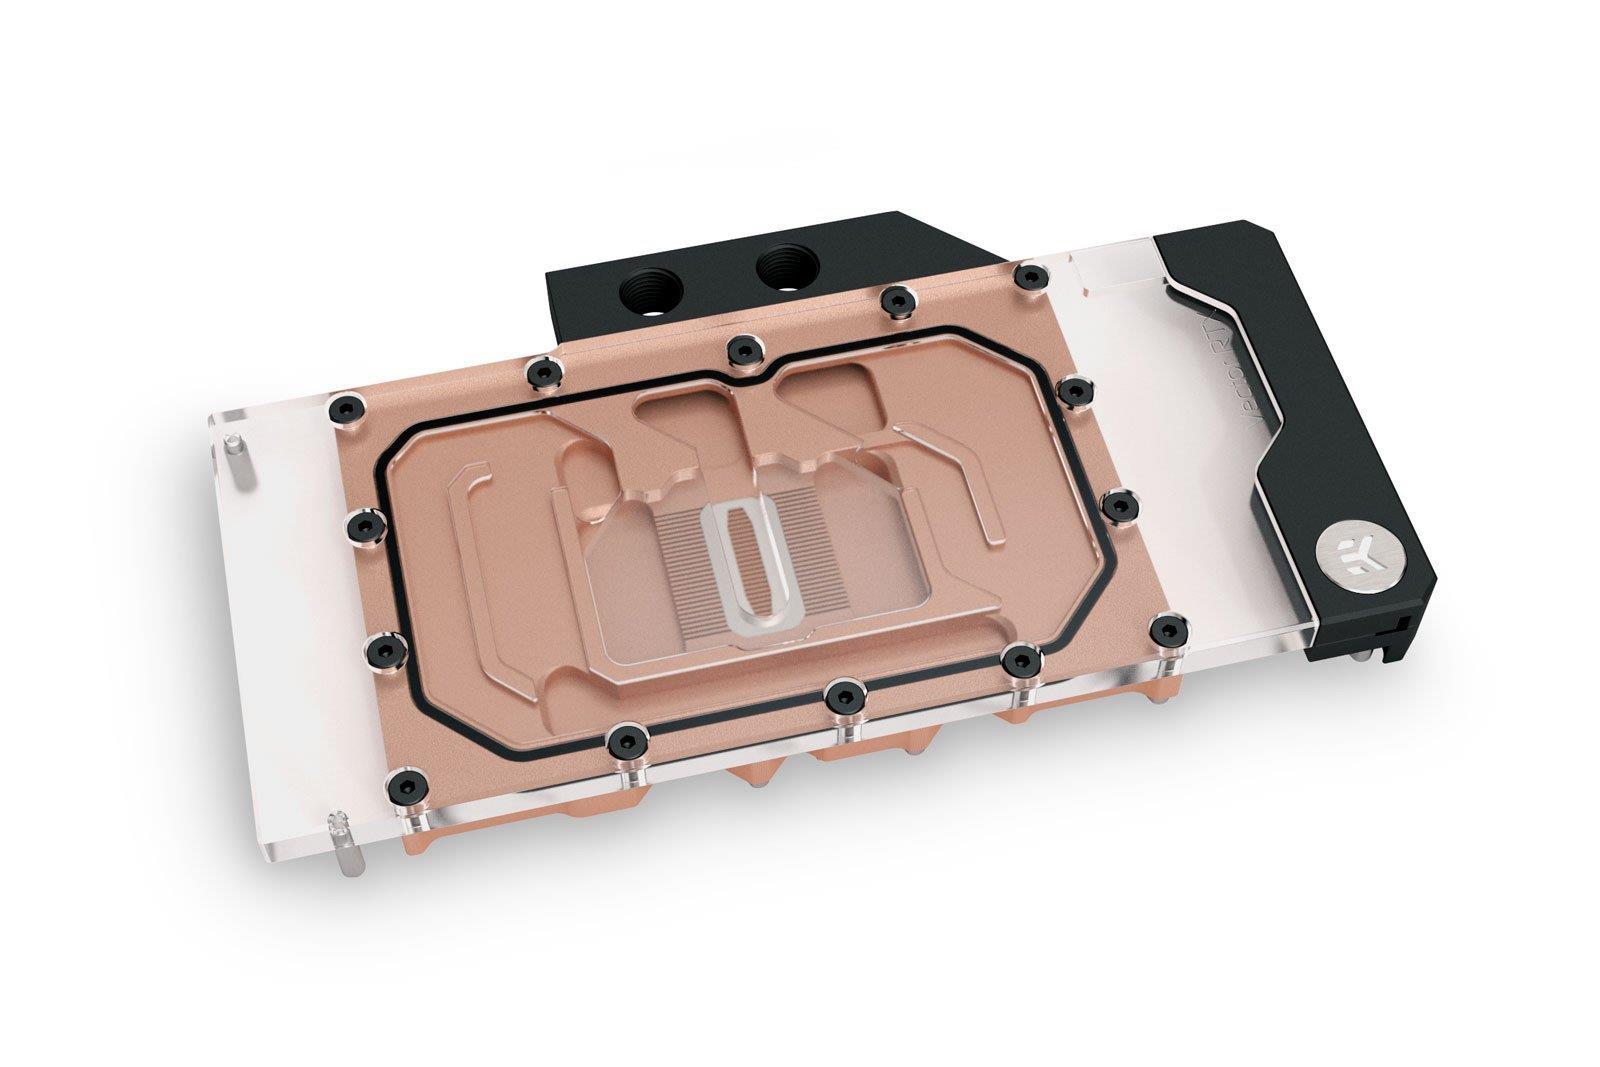 Nvidia Geforce RTX 3080 and RTX 3090 EK water block Copper Acrylic